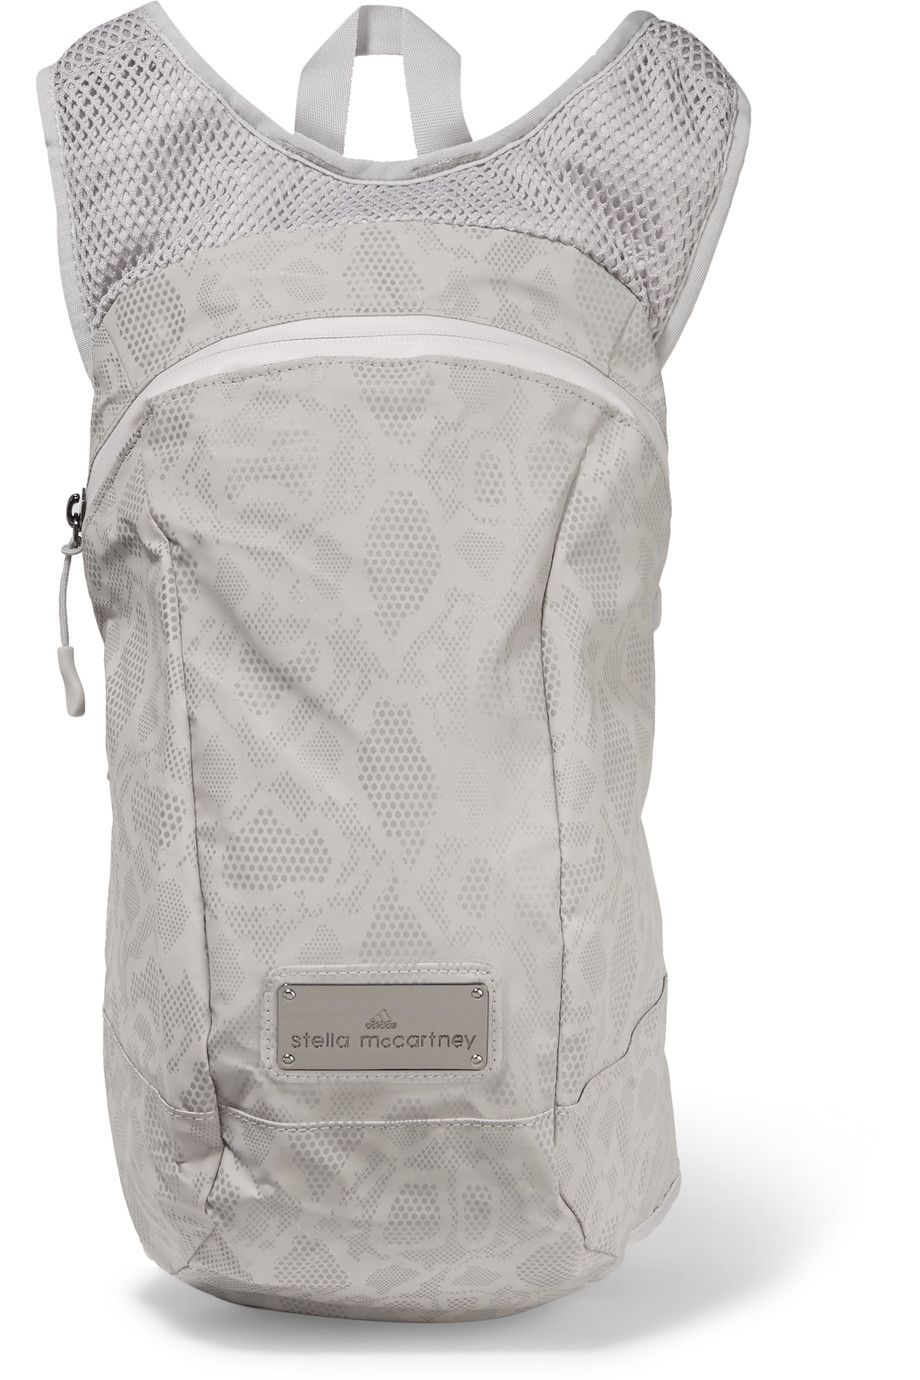 e213494bfaf0 ADIDAS BY STELLA MCCARTNEY Reflective Shell And Mesh Backpack.   adidasbystellamccartney  bags  canvas  backpacks  stone